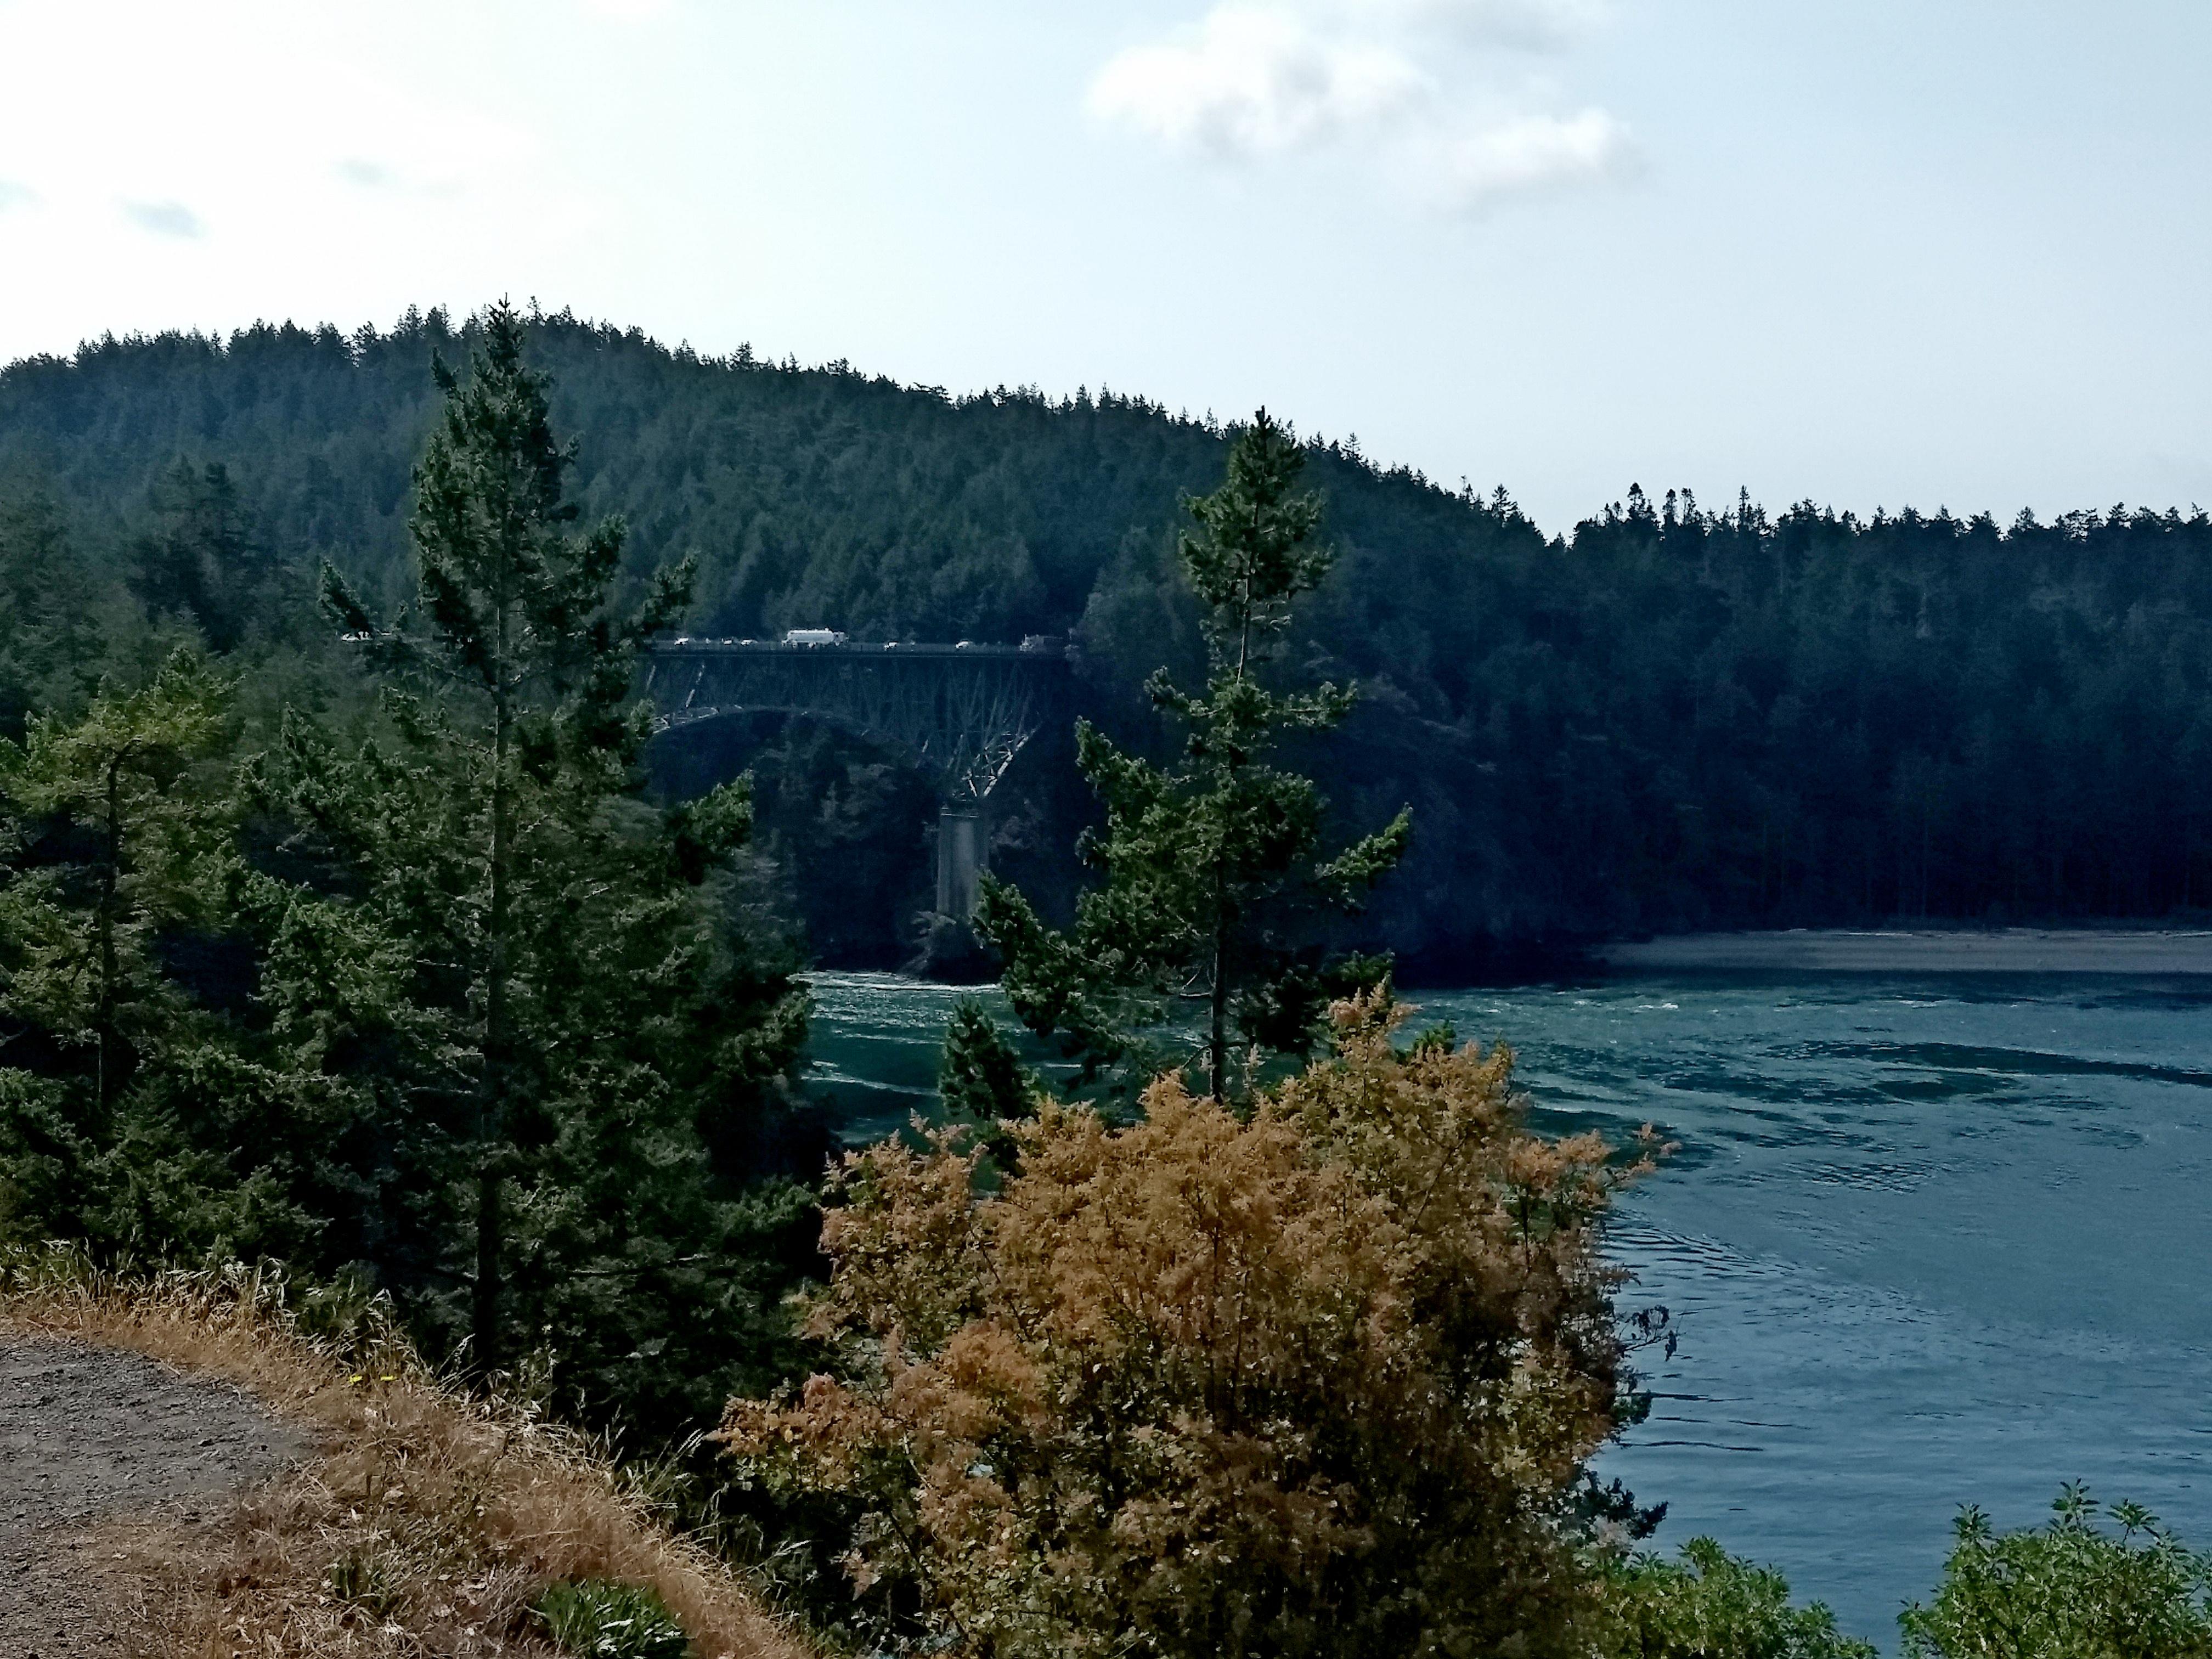 Deception Pass Bridge from Fidalgo Island